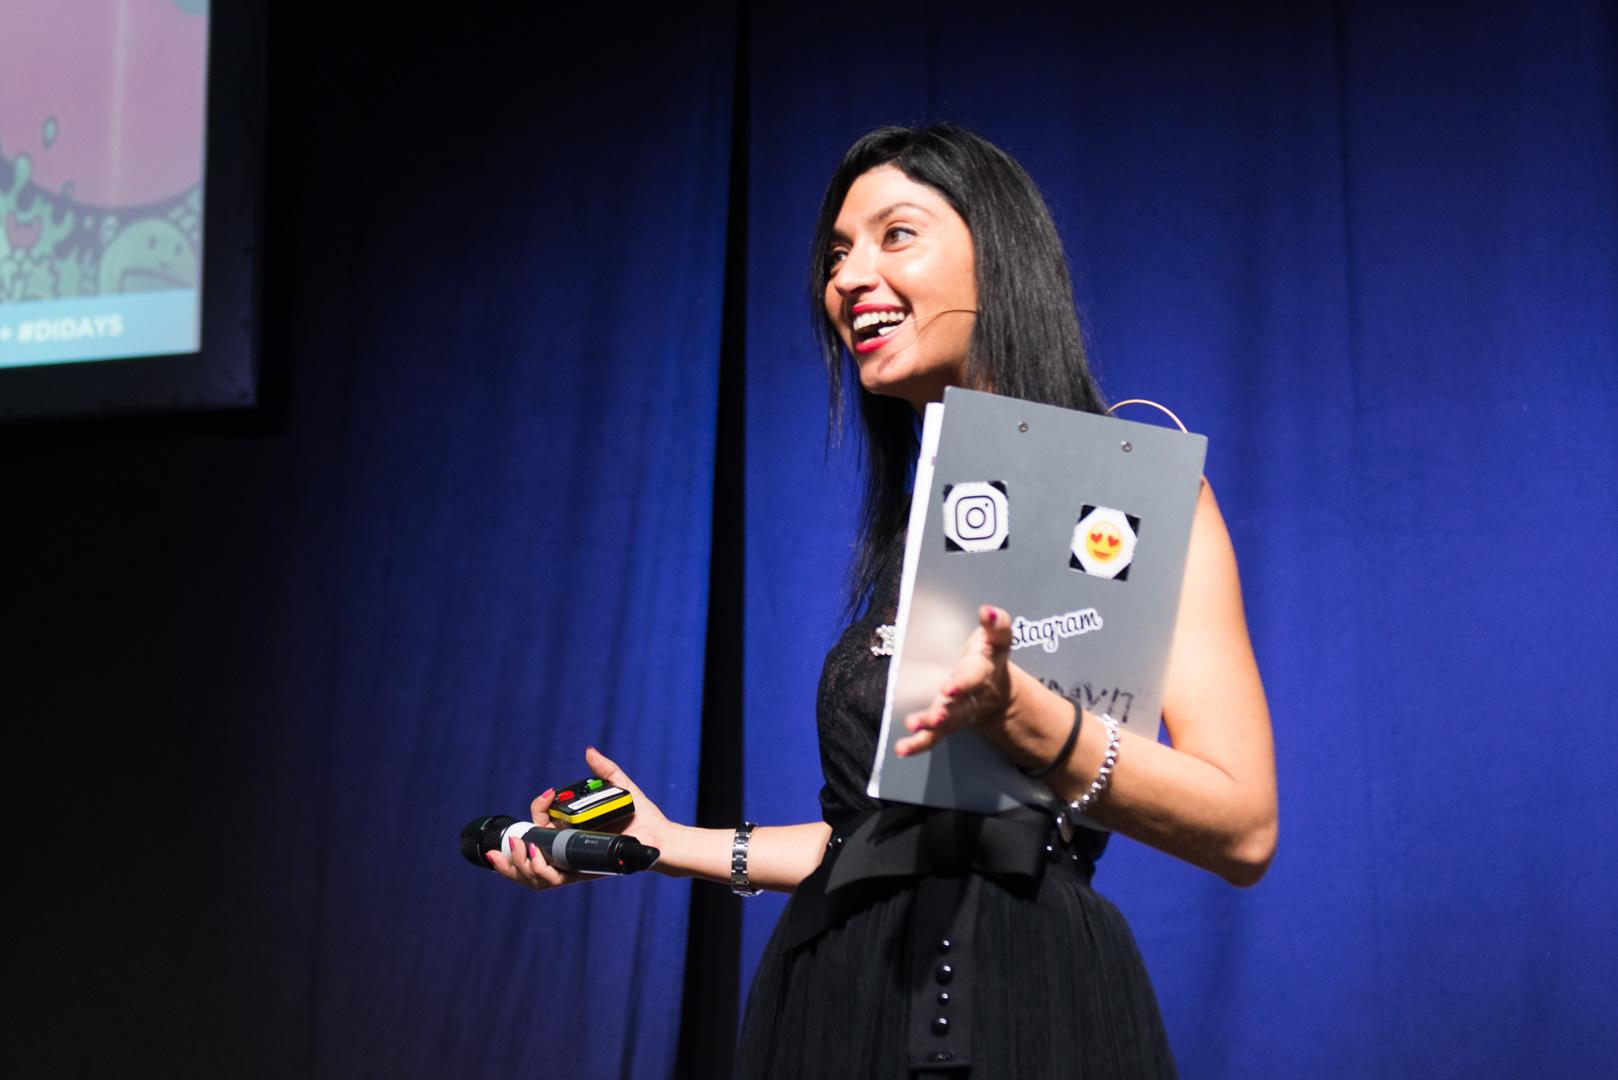 Eleonora Rocca - CEO & Founder of Mashable Social Media Day Italy